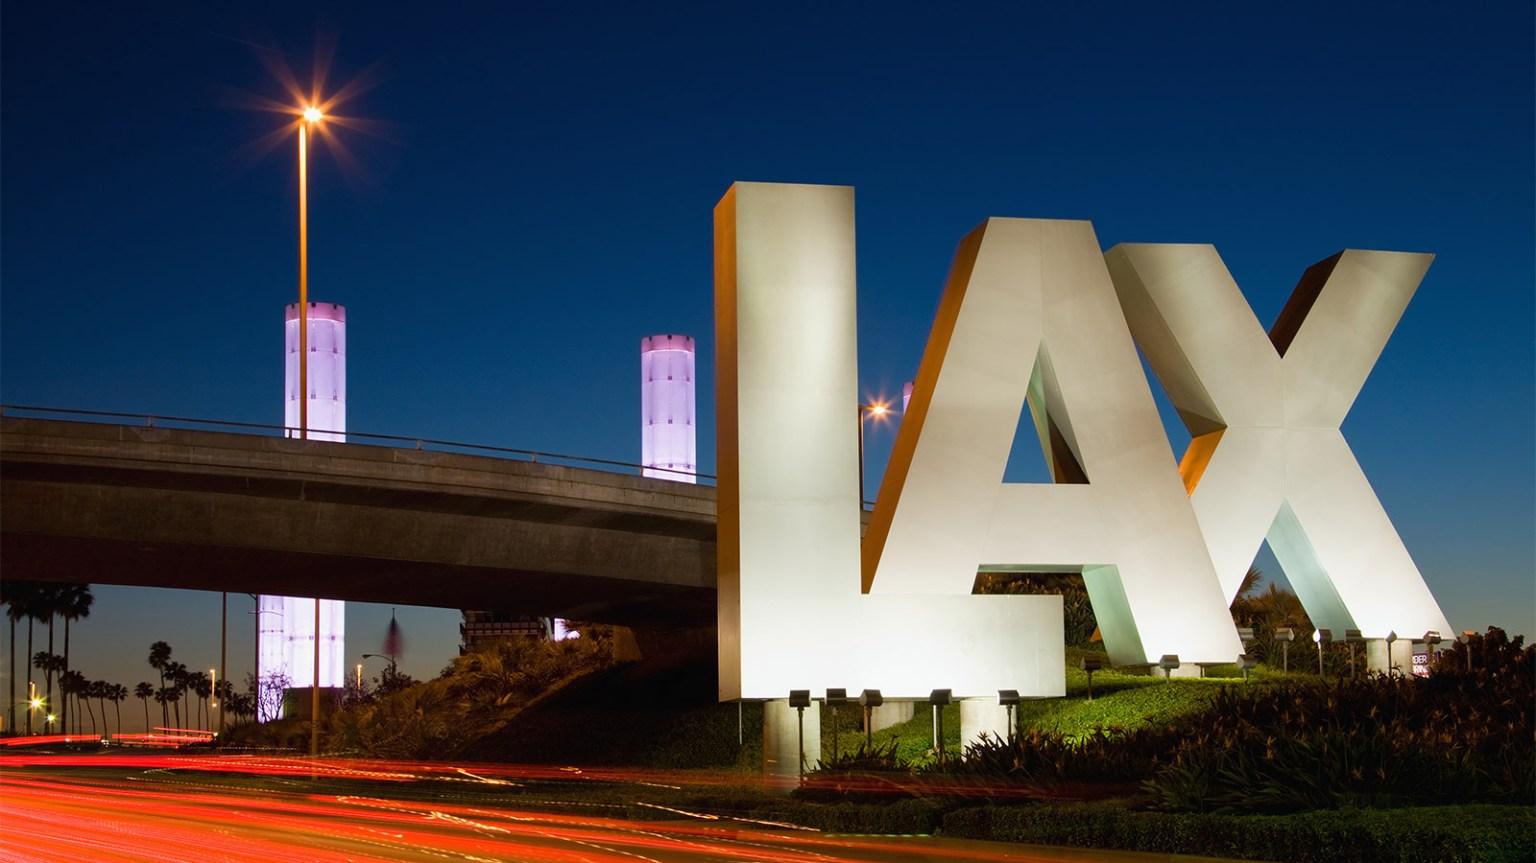 LAX Customs Preparing For 300% Increase In International Travelers This Summer